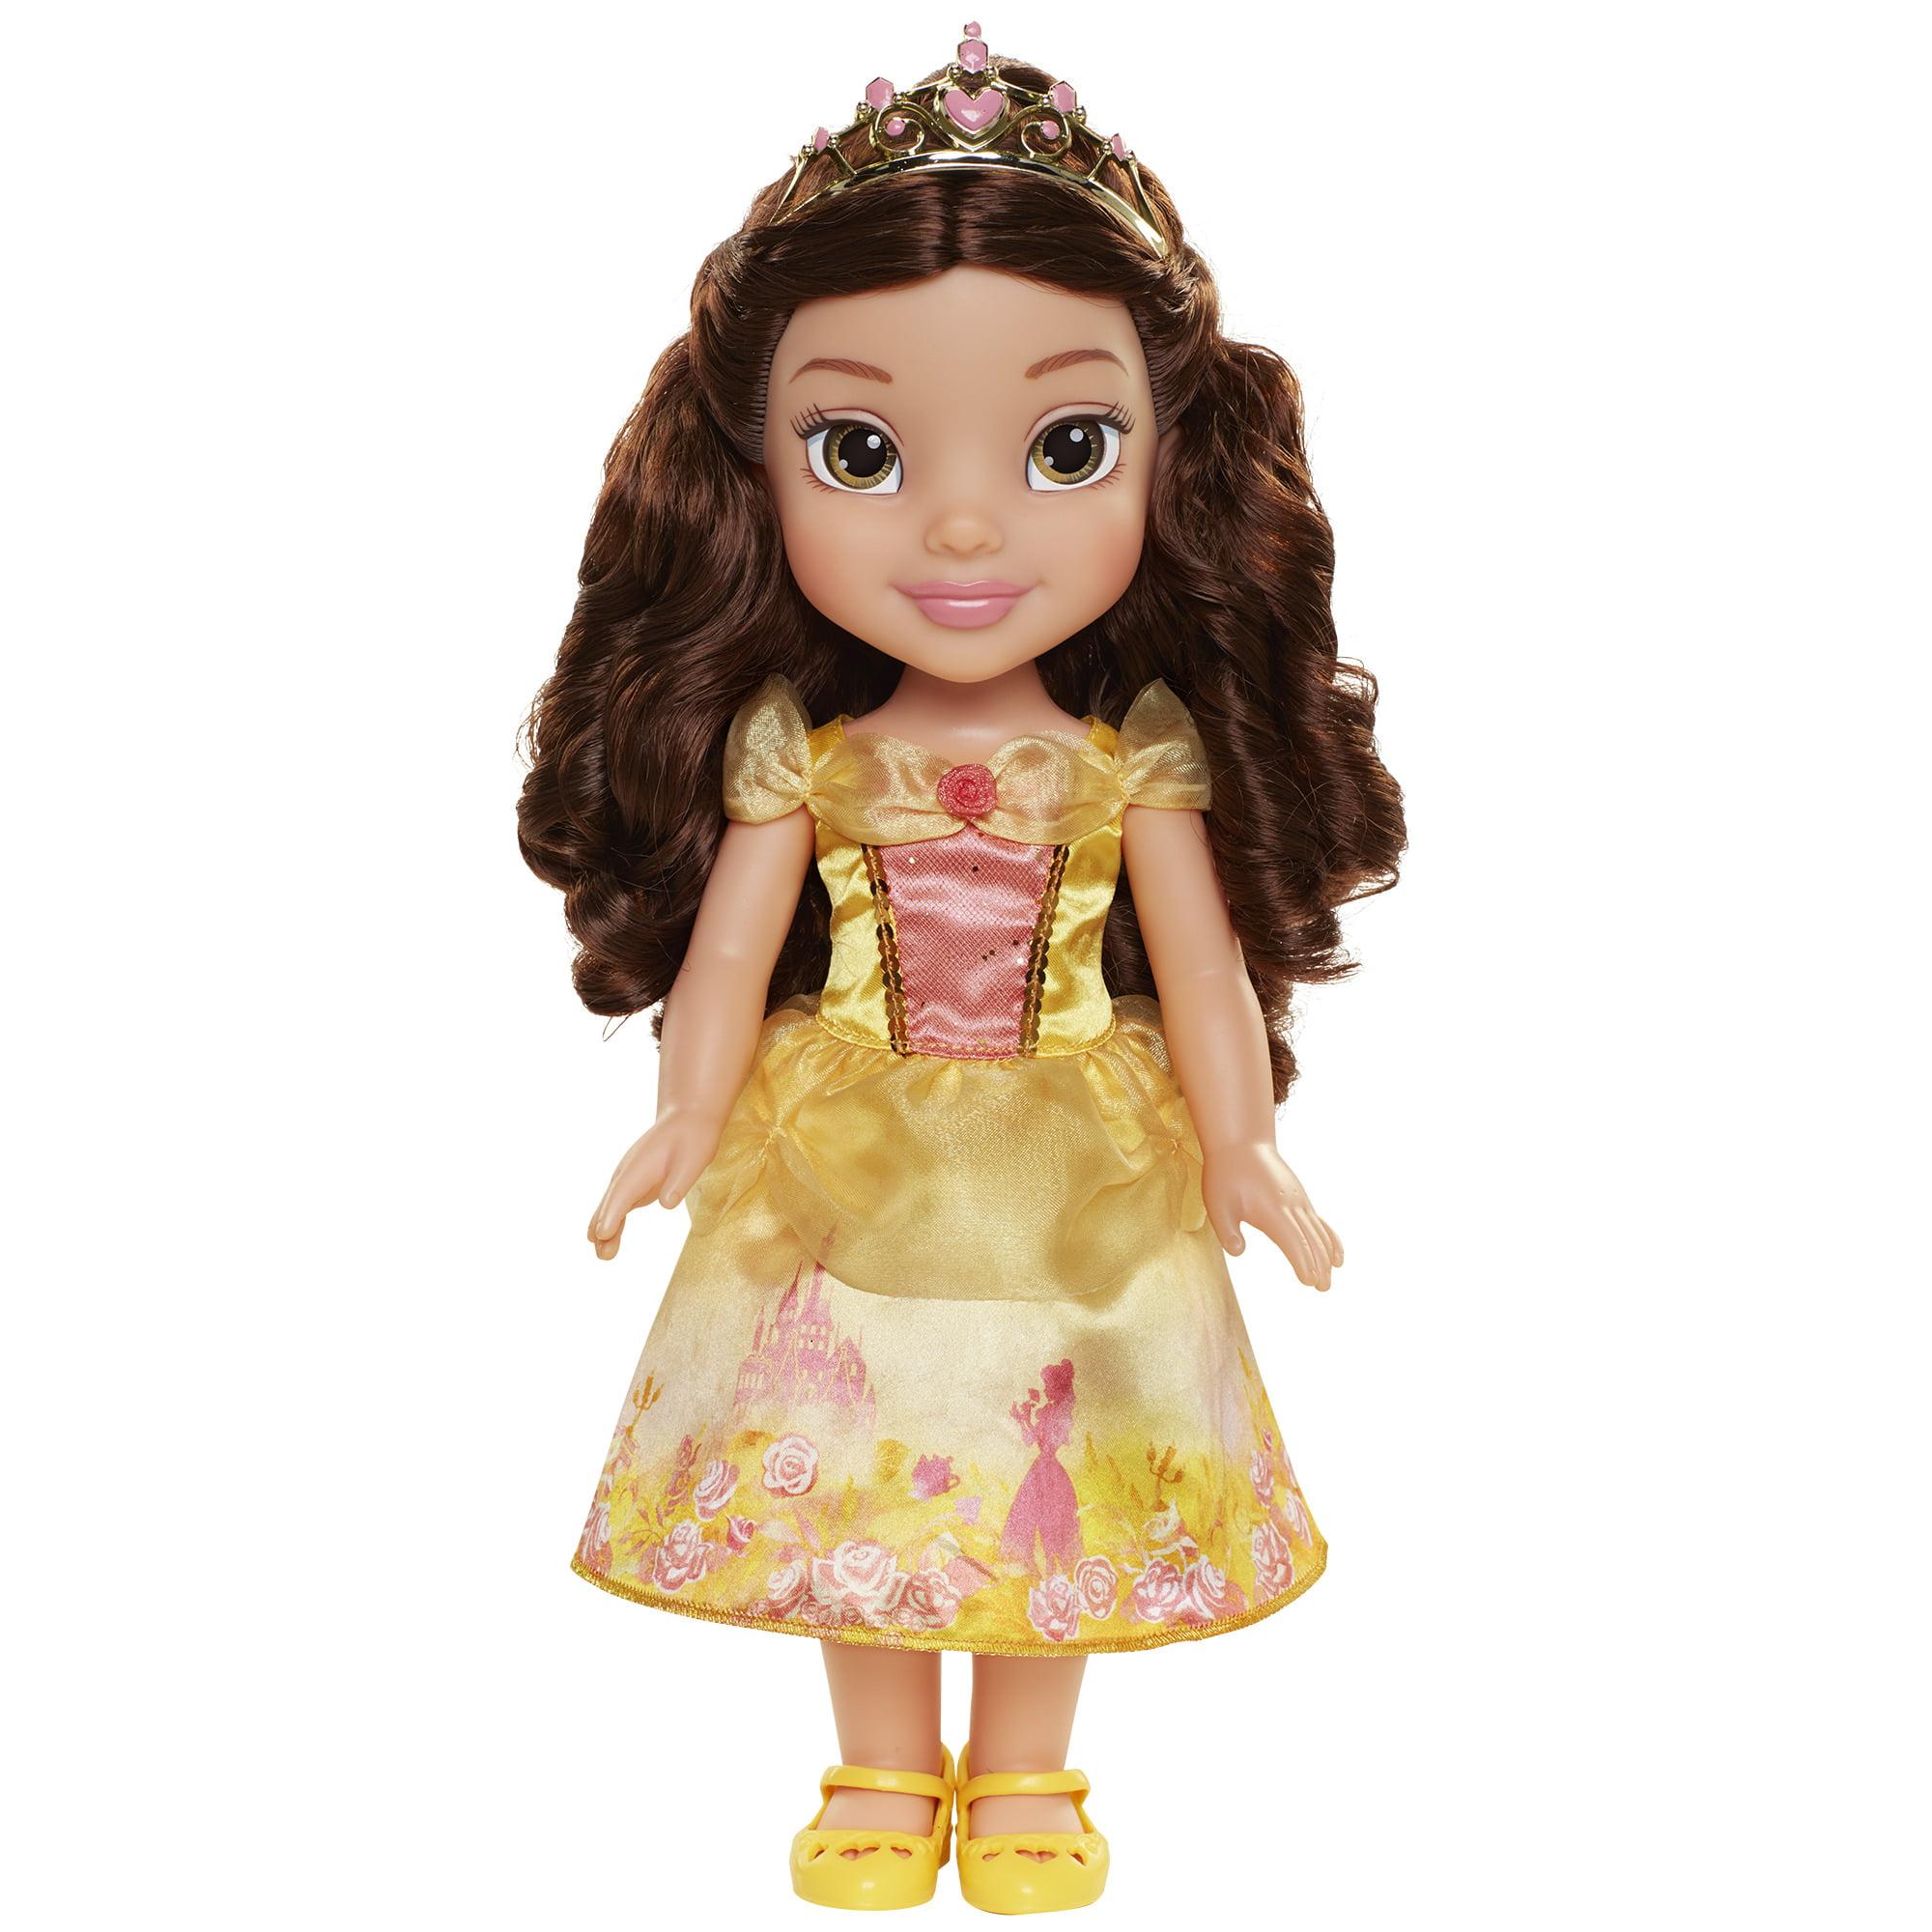 Disney Princess Explore Your World Belle Large Toddler Doll